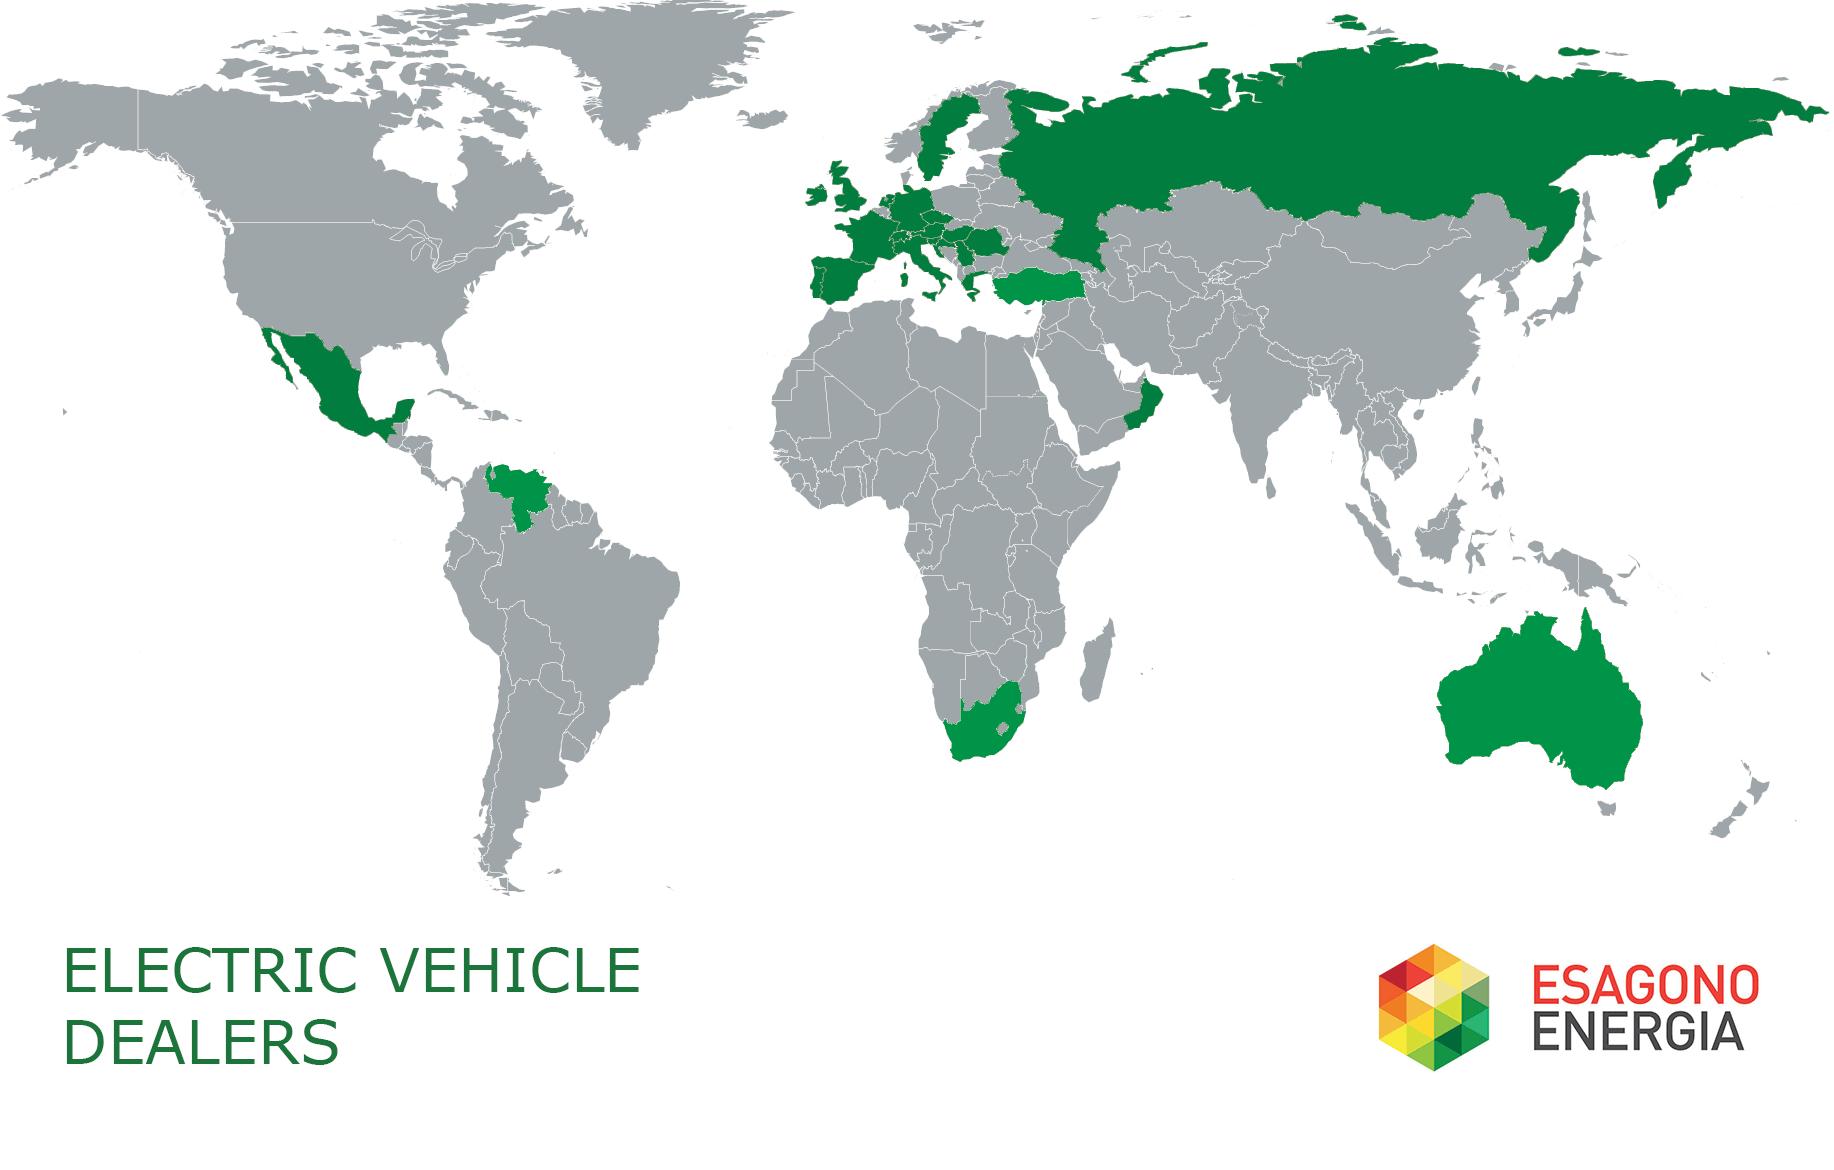 electric vehicle dealers Esagono Energia